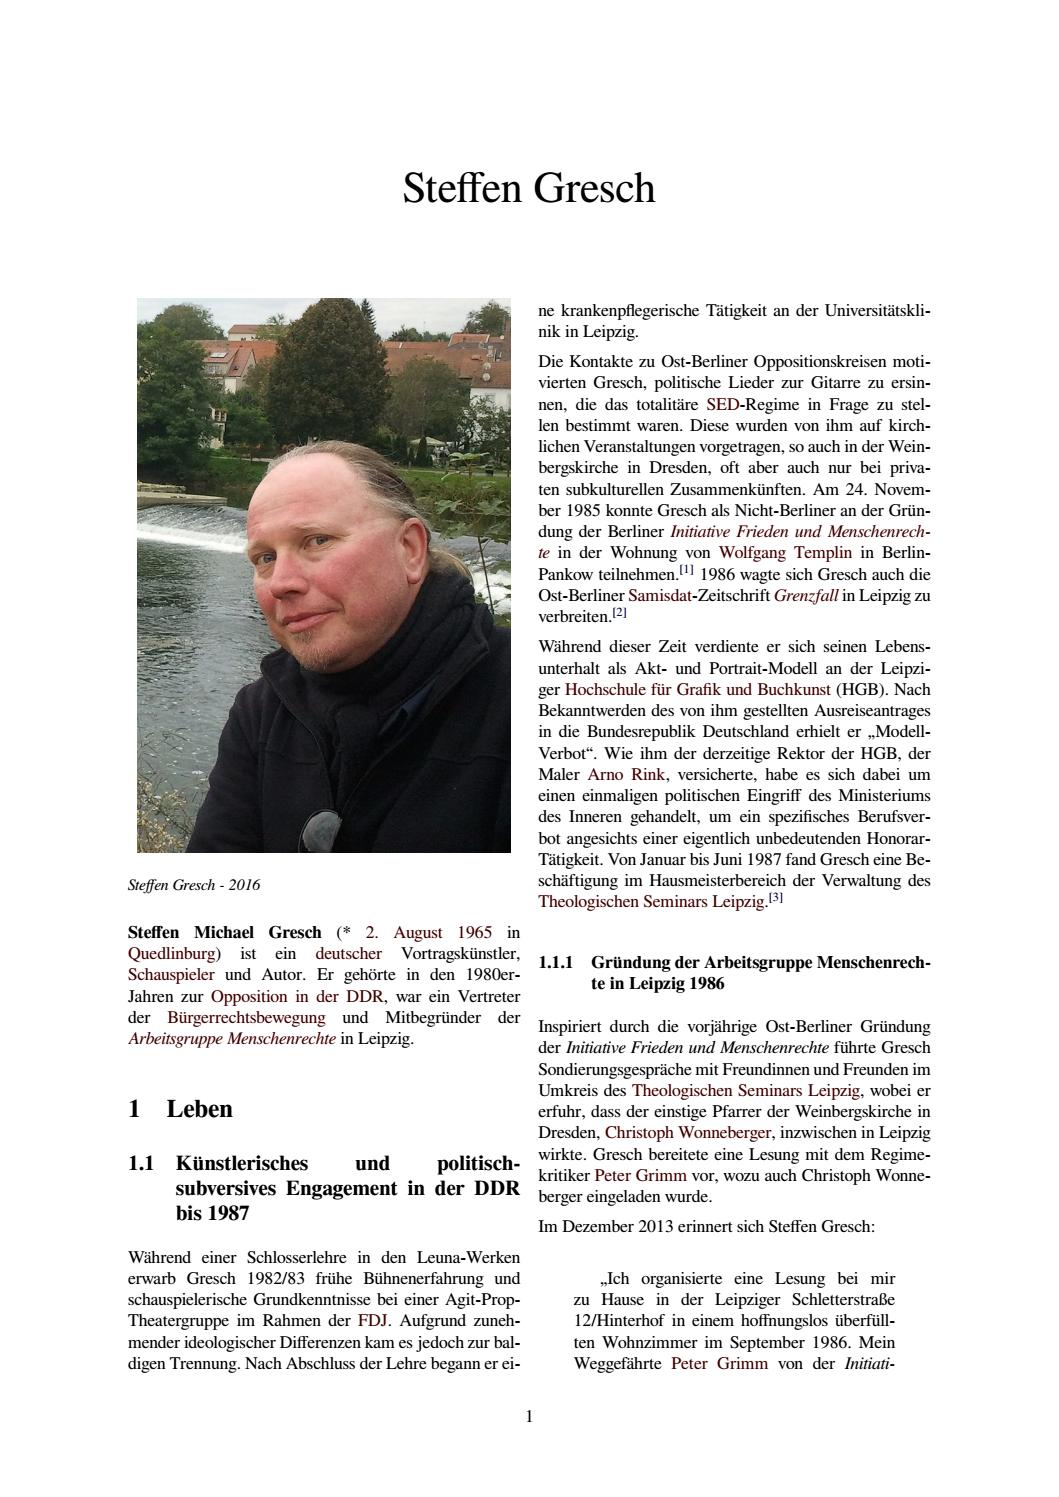 Schön Rahmen Menders Fotos - Benutzerdefinierte Bilderrahmen Ideen ...